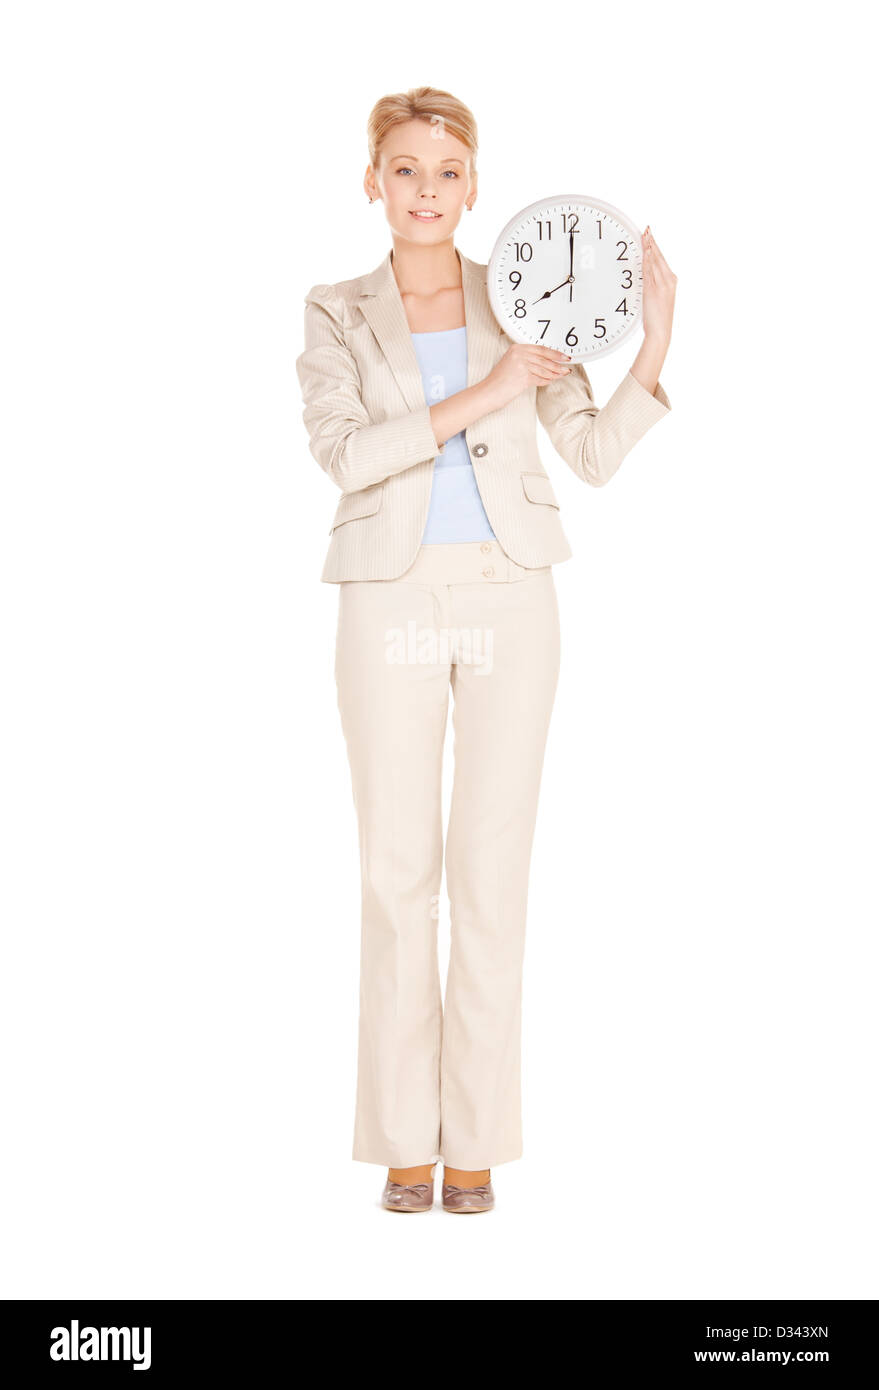 woman holding big clock - Stock Image